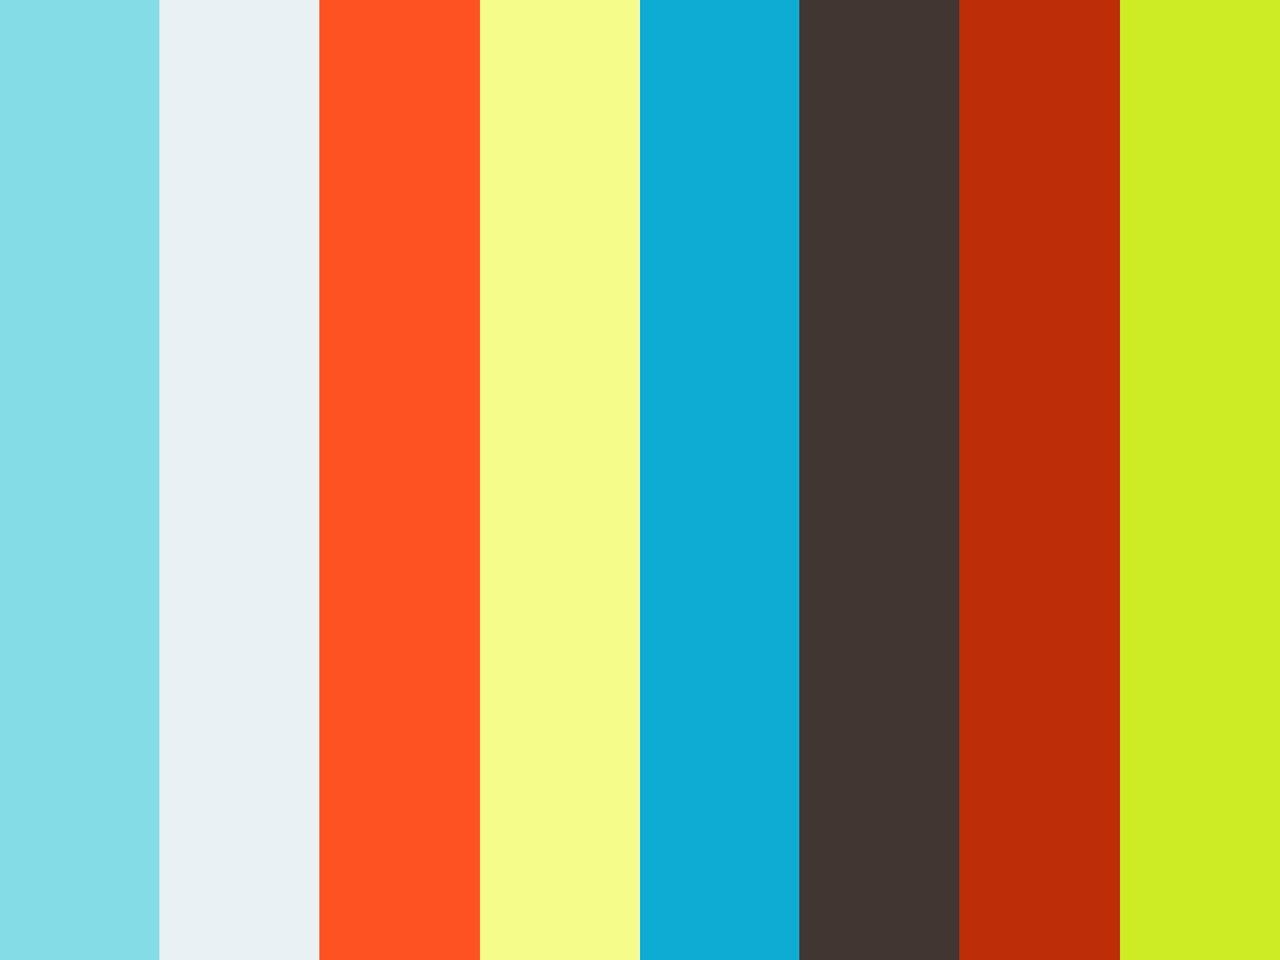 Molokai Civid19 Update - Monday, May 18, 2020